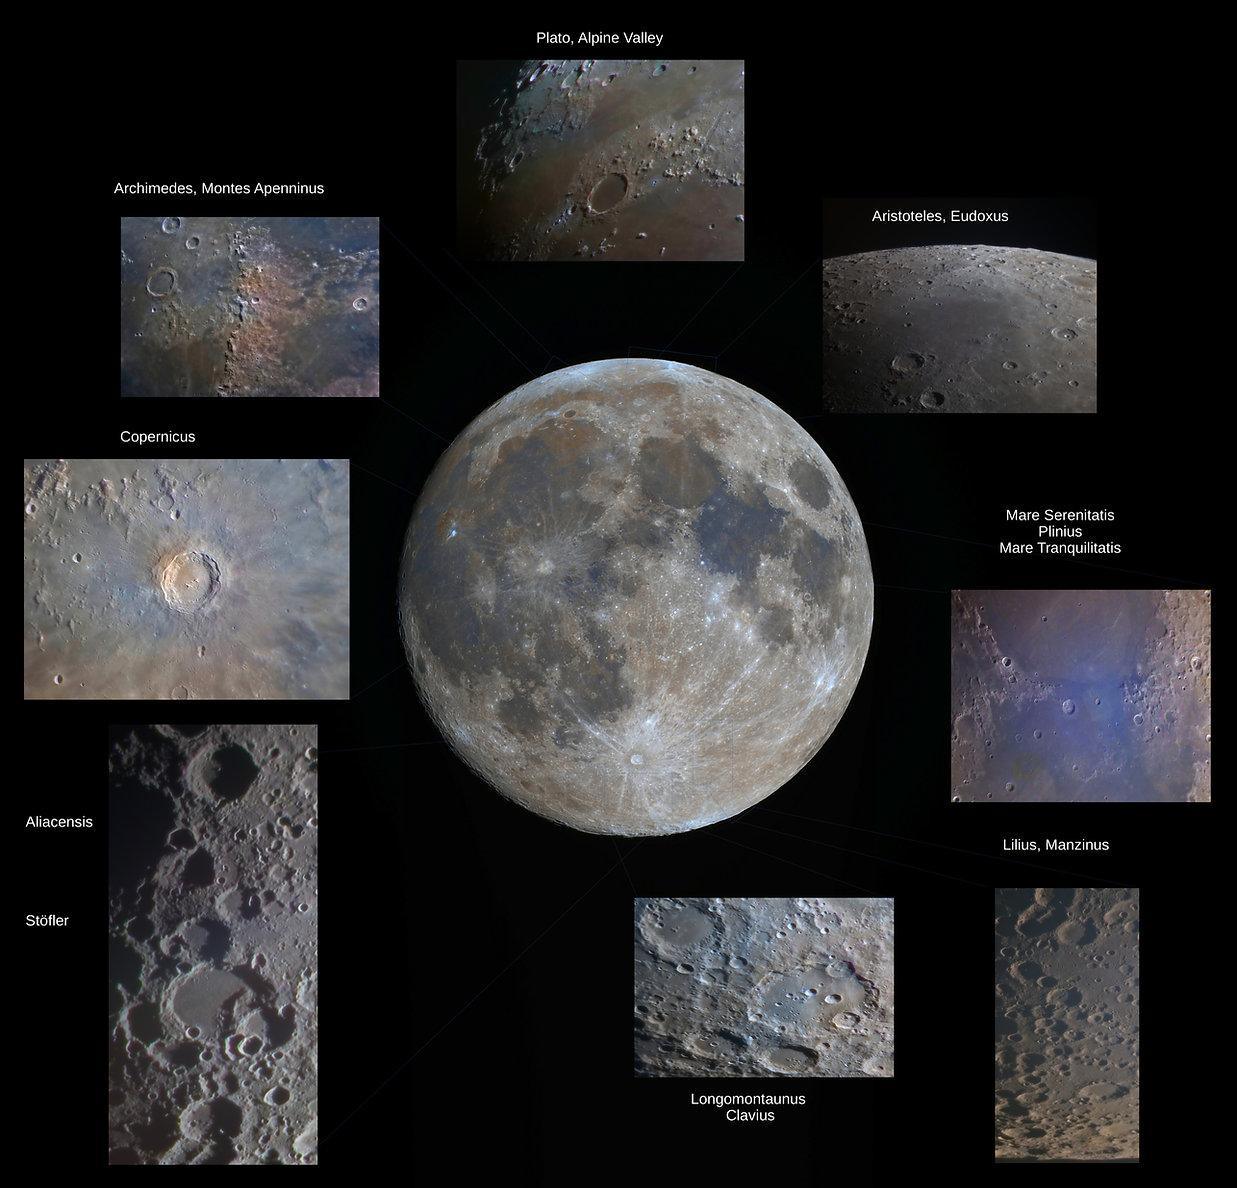 Mond Nahaufnahmen: Copernicus, Aristoteles, Eudoxus, Platon, Clavius, Alpental